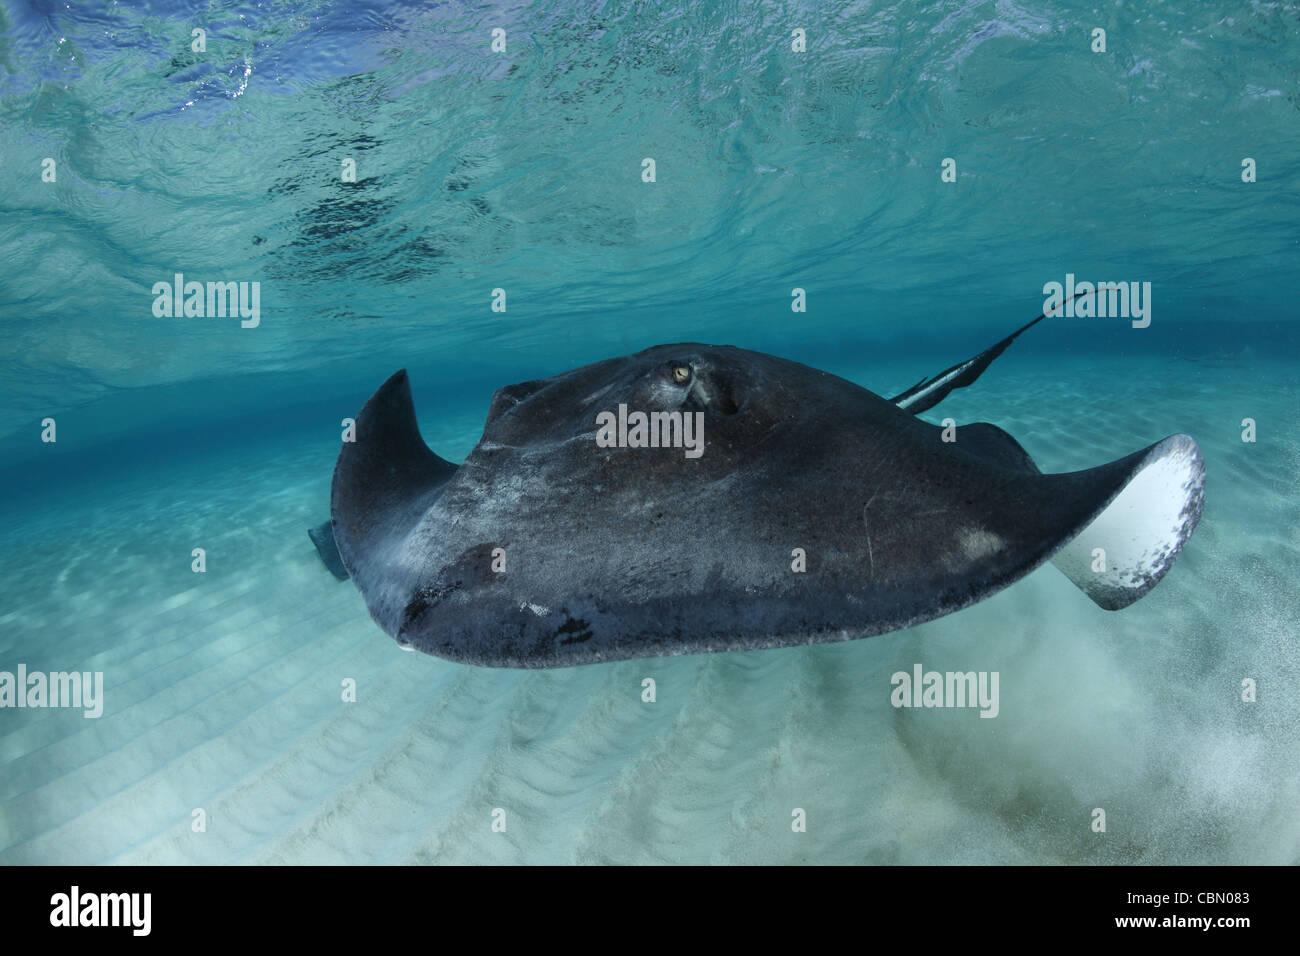 Southern Stingrays, Dasyatis americana, Sandbar, Grand Cayman, Cayman Islands Stock Photo